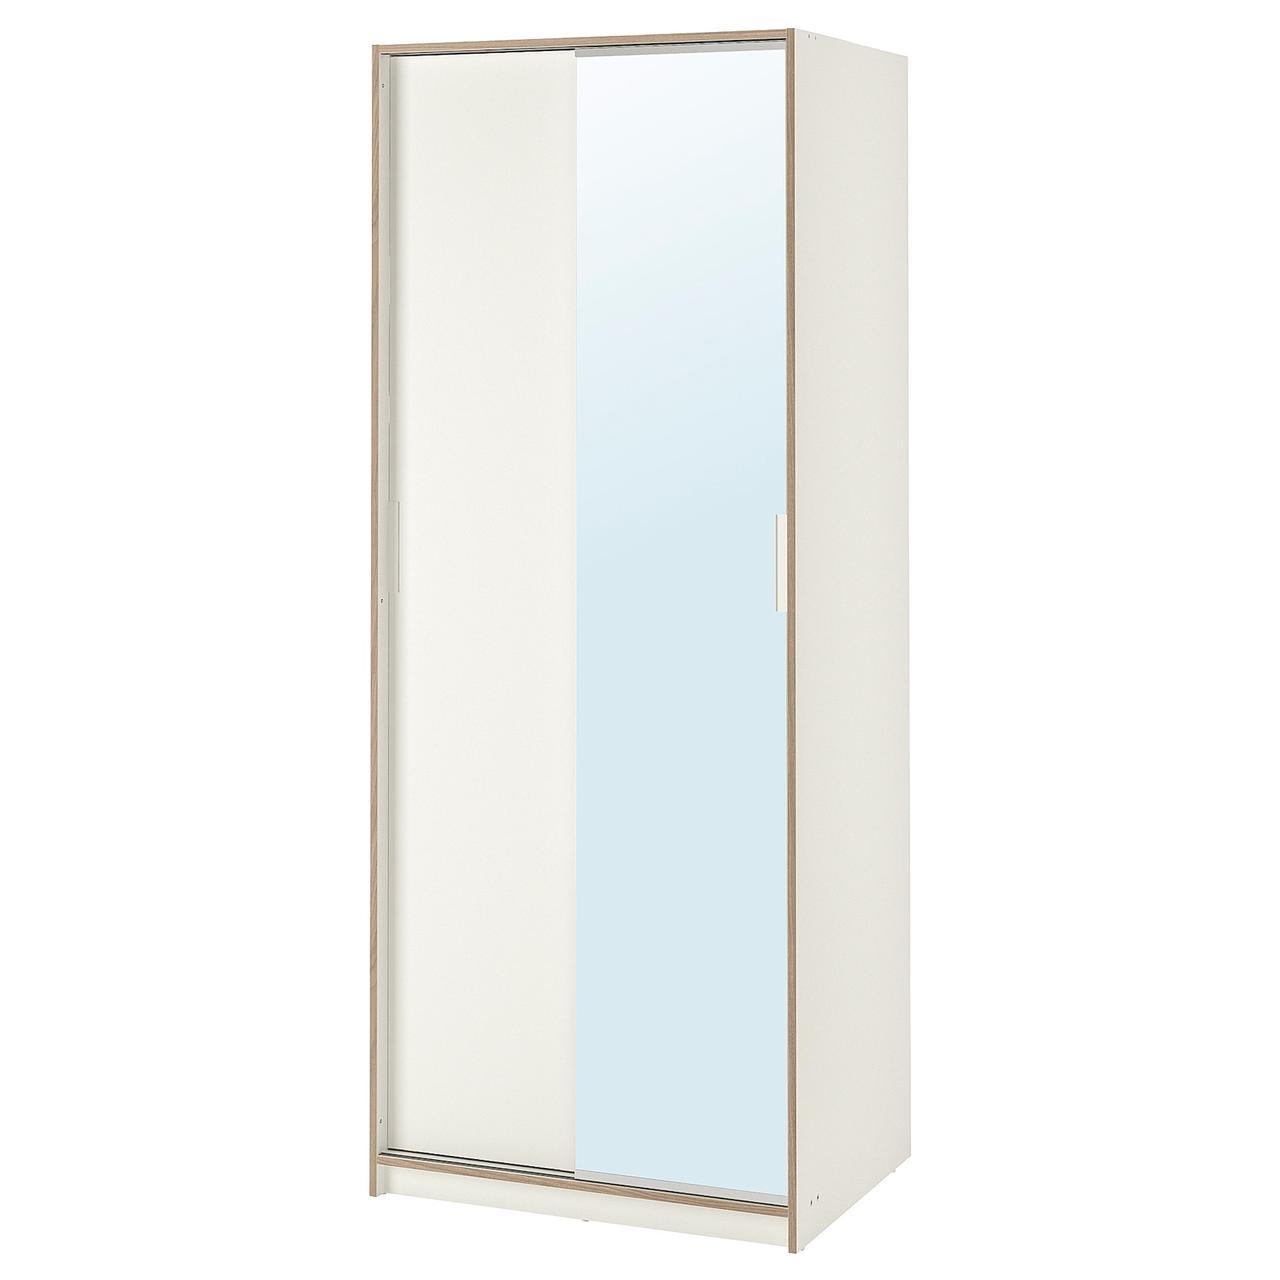 Гардеробна шафа з дзеркалом TRYSIL